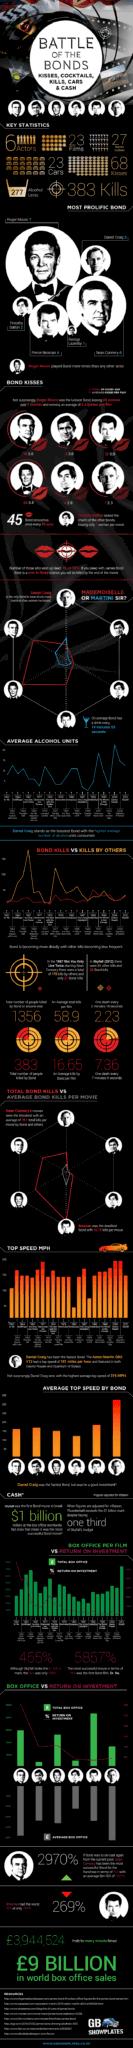 Bond_Infographic_final-015